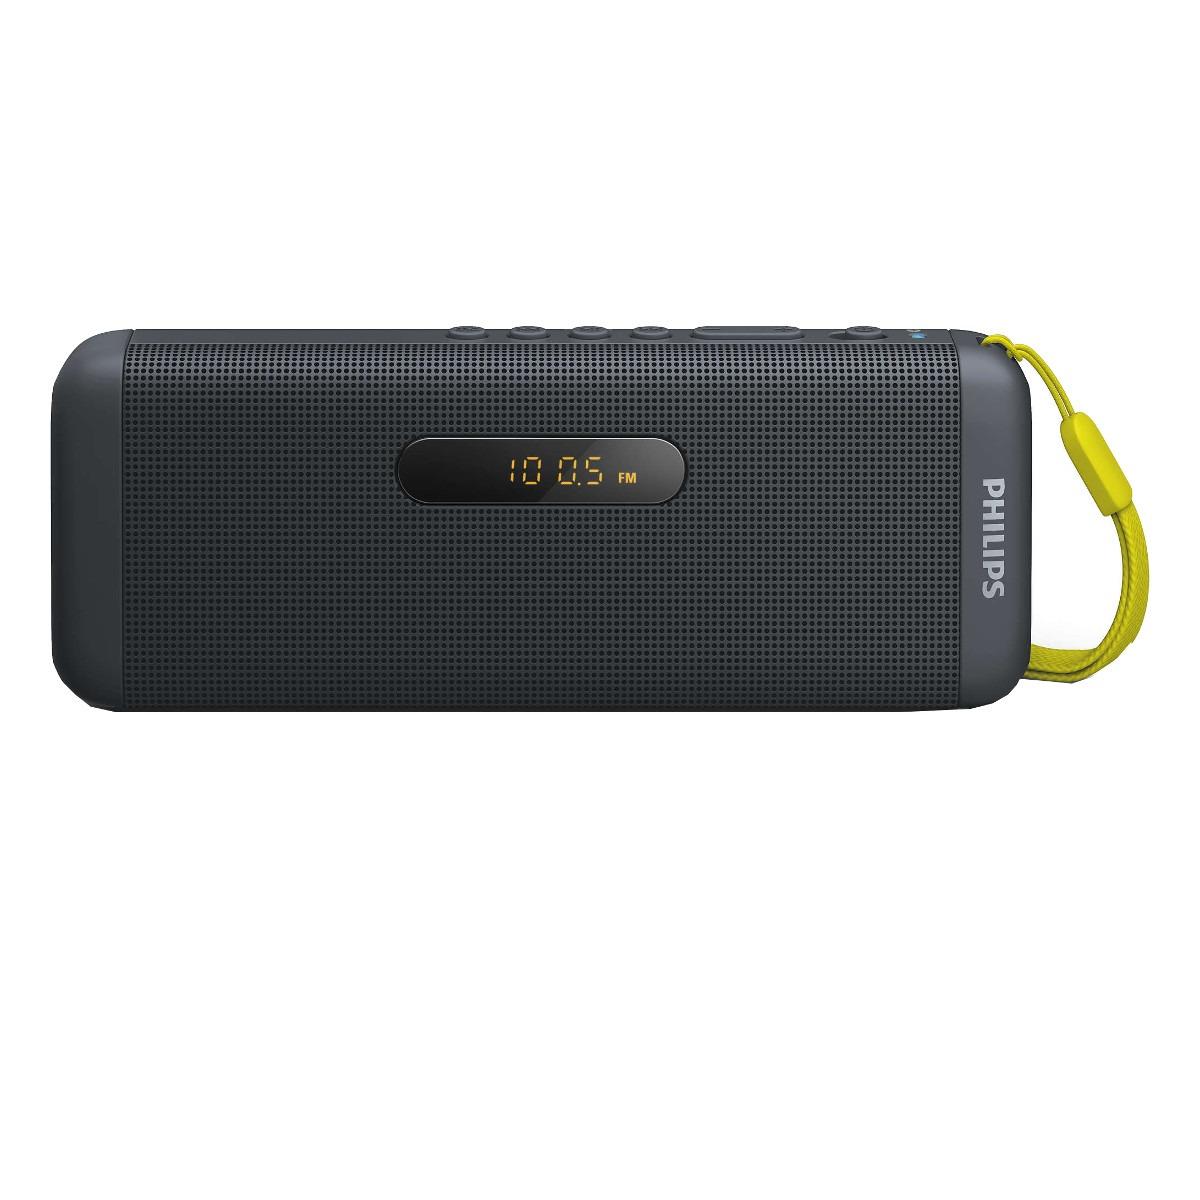 SD700B SD700B/00 datoru skaļruņi